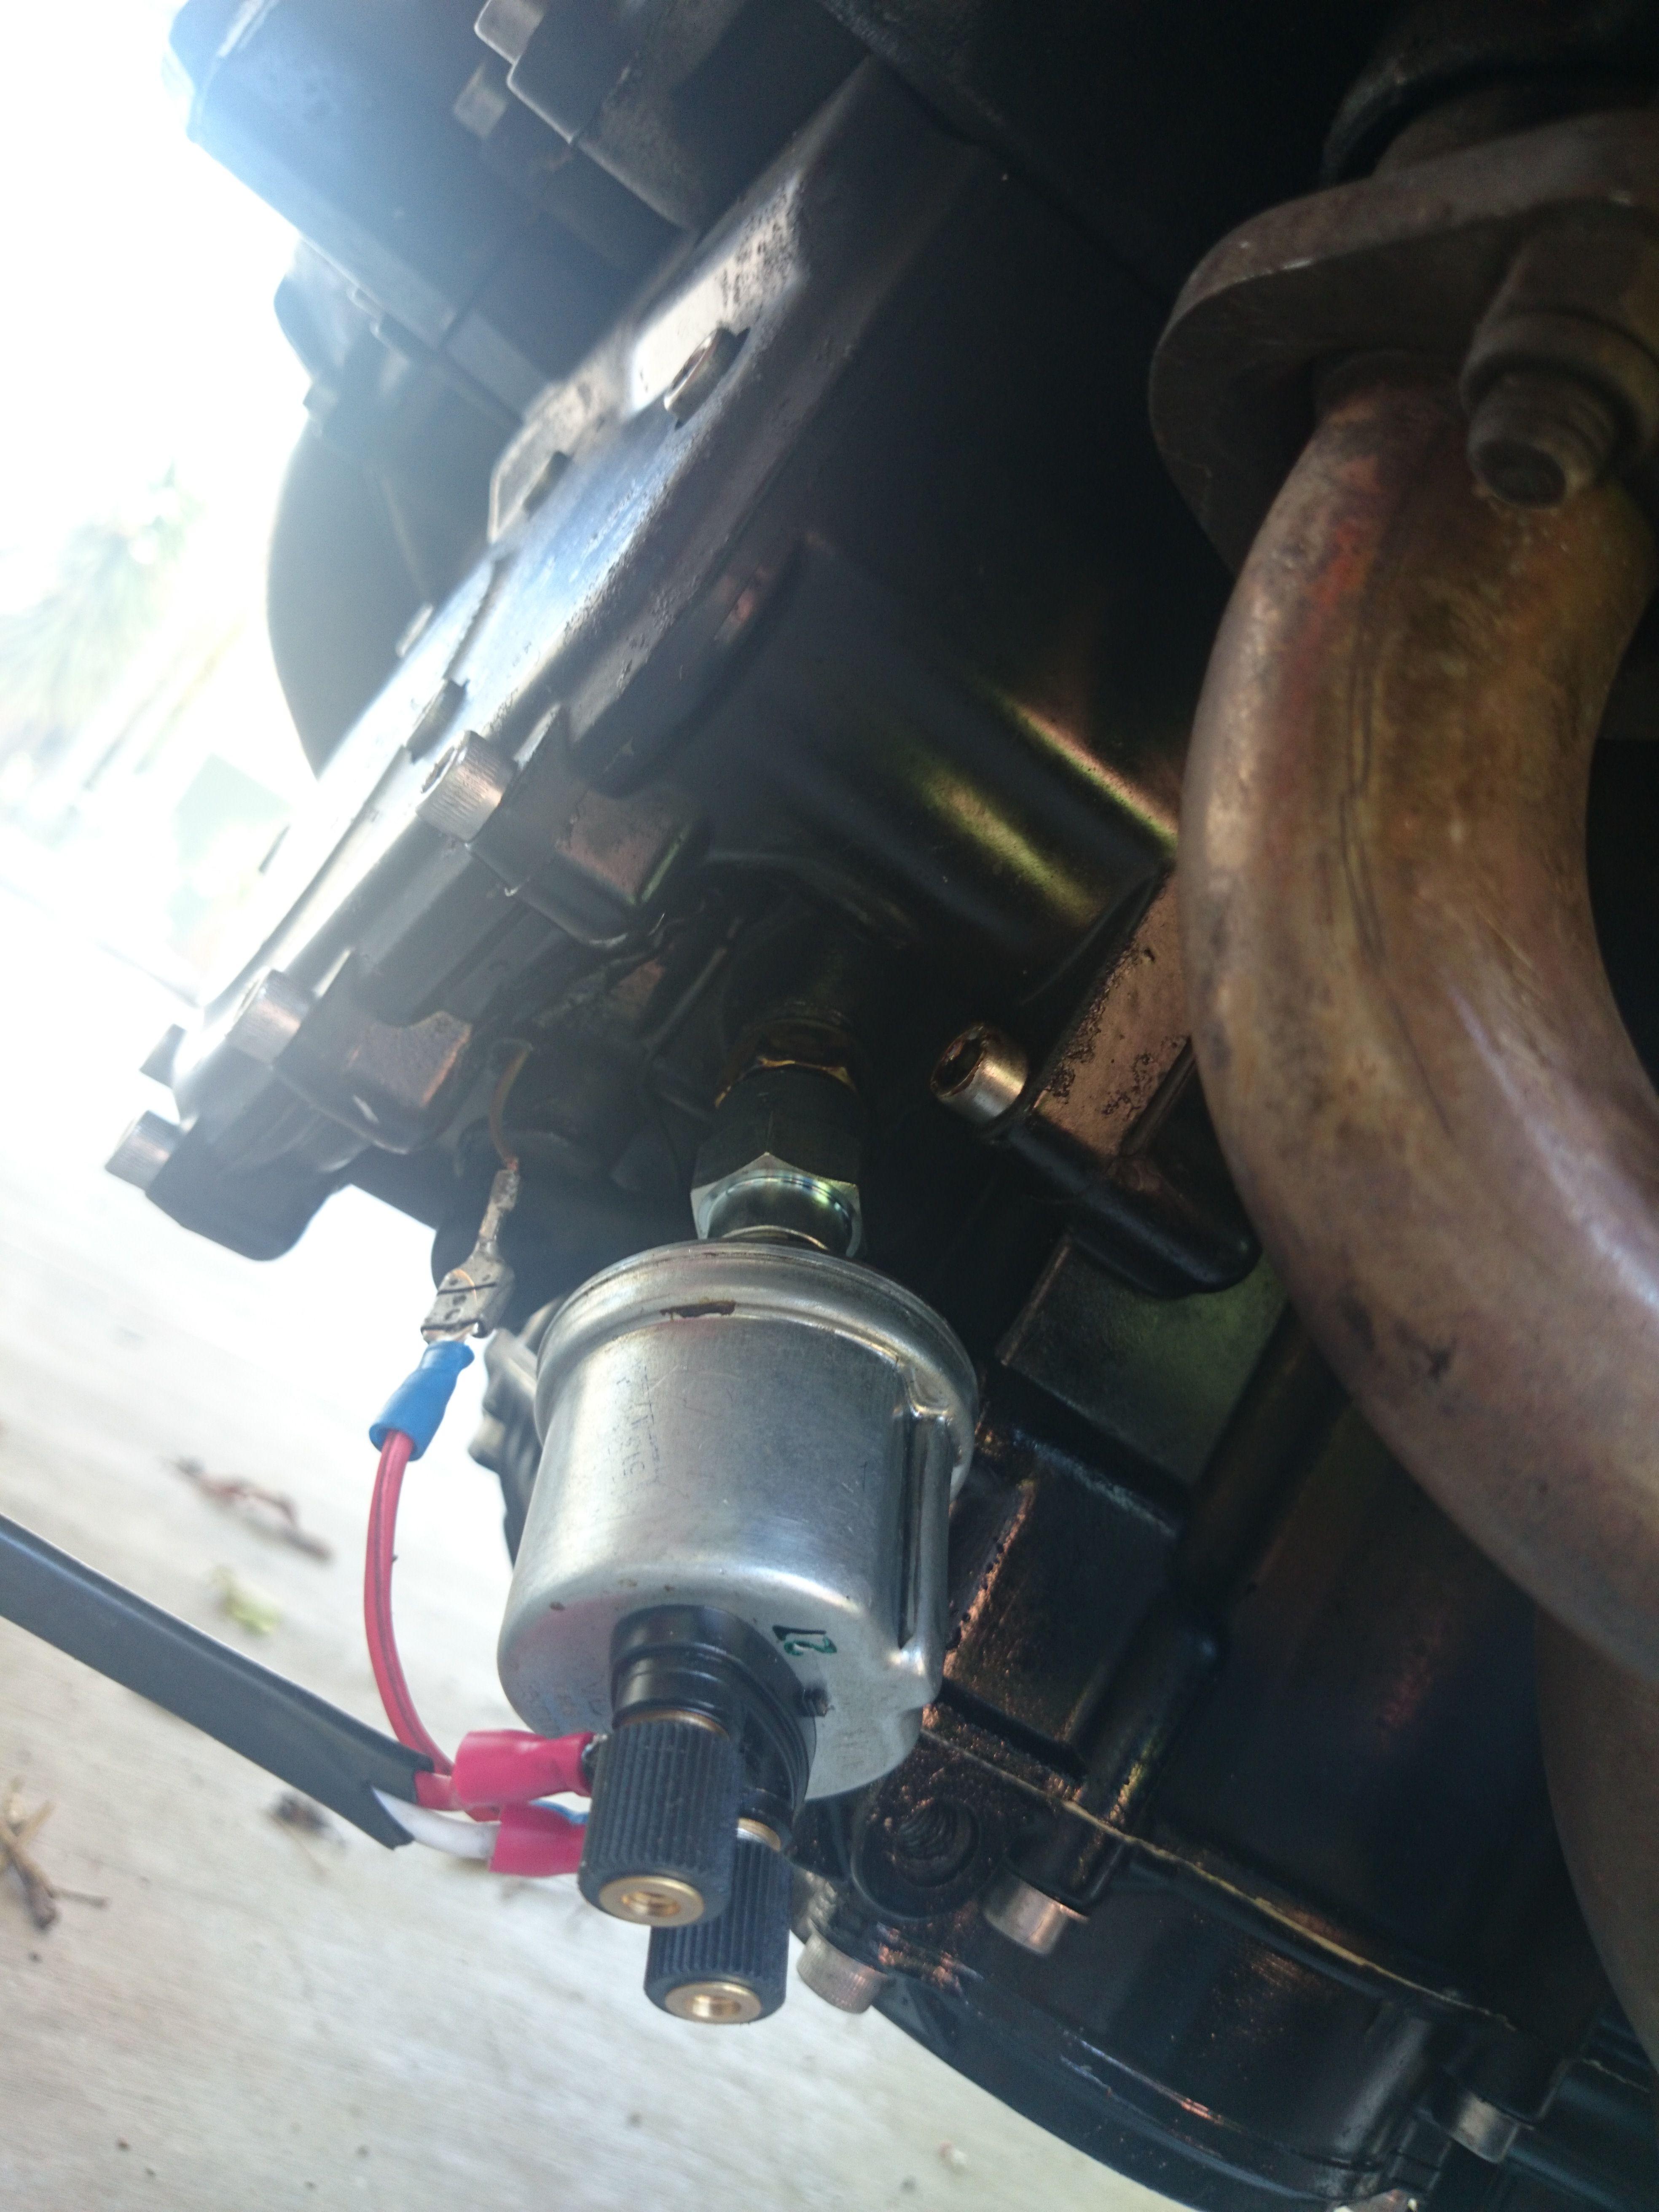 Adding extra gauges - Oil pressure - Volts....... D13e55d6ebbb499e0c8e2687f9f71acb